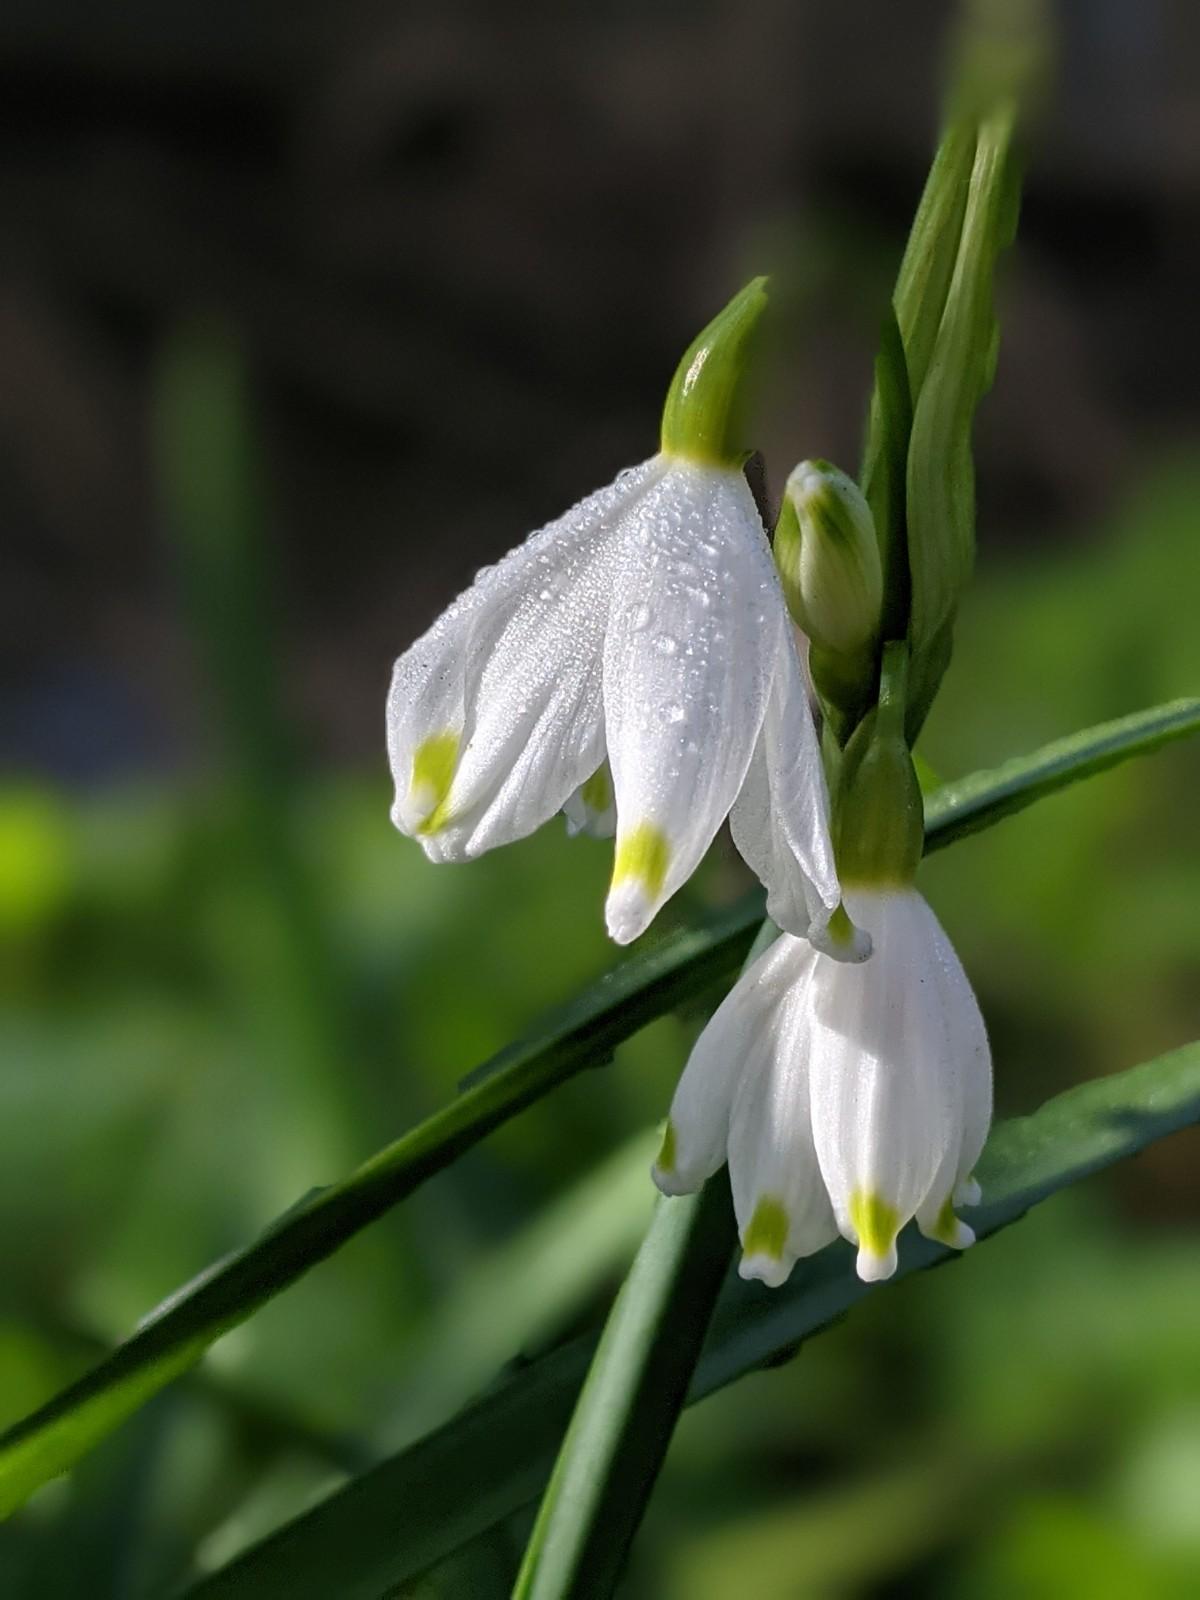 The Loddon Lily